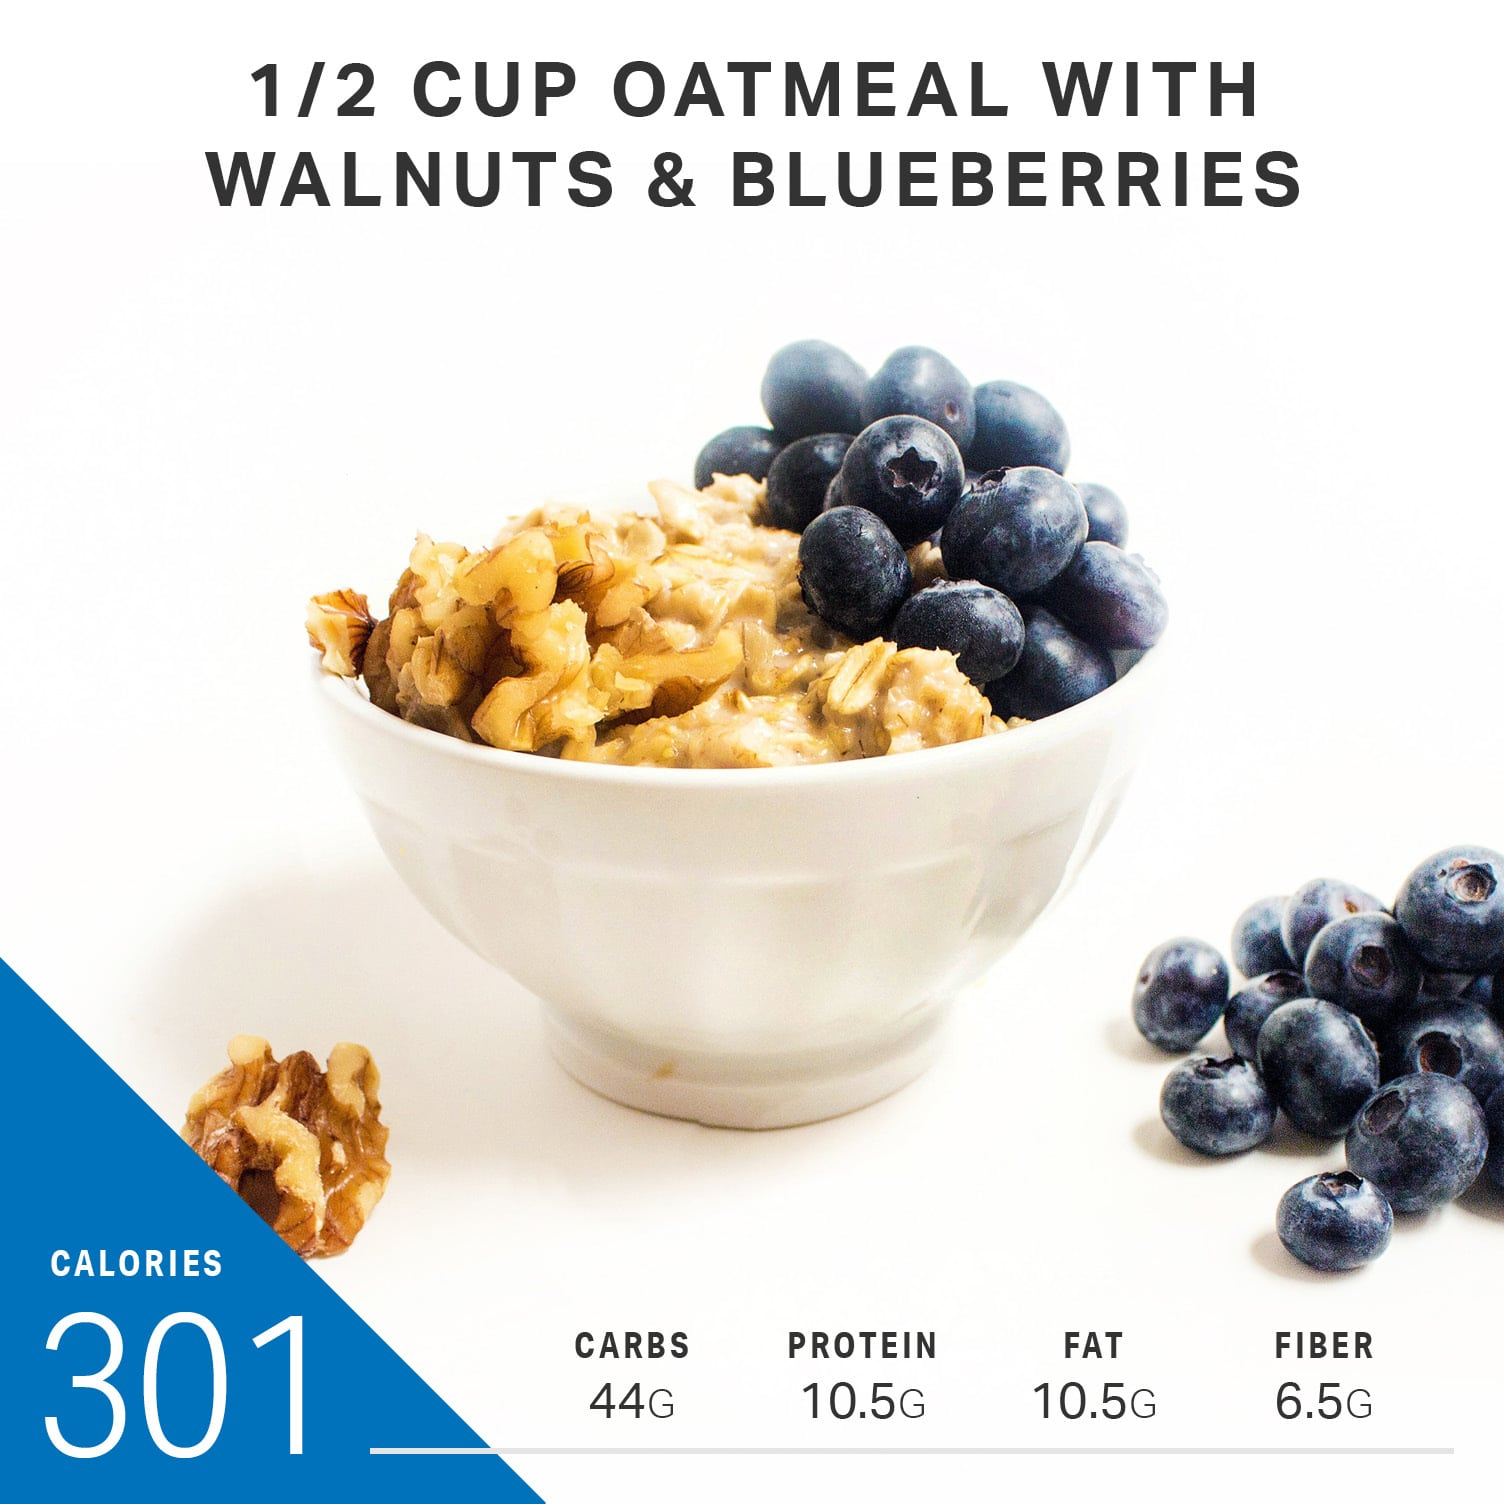 UACF-What-1200-Calories-Looks-LIke-update-.jpg